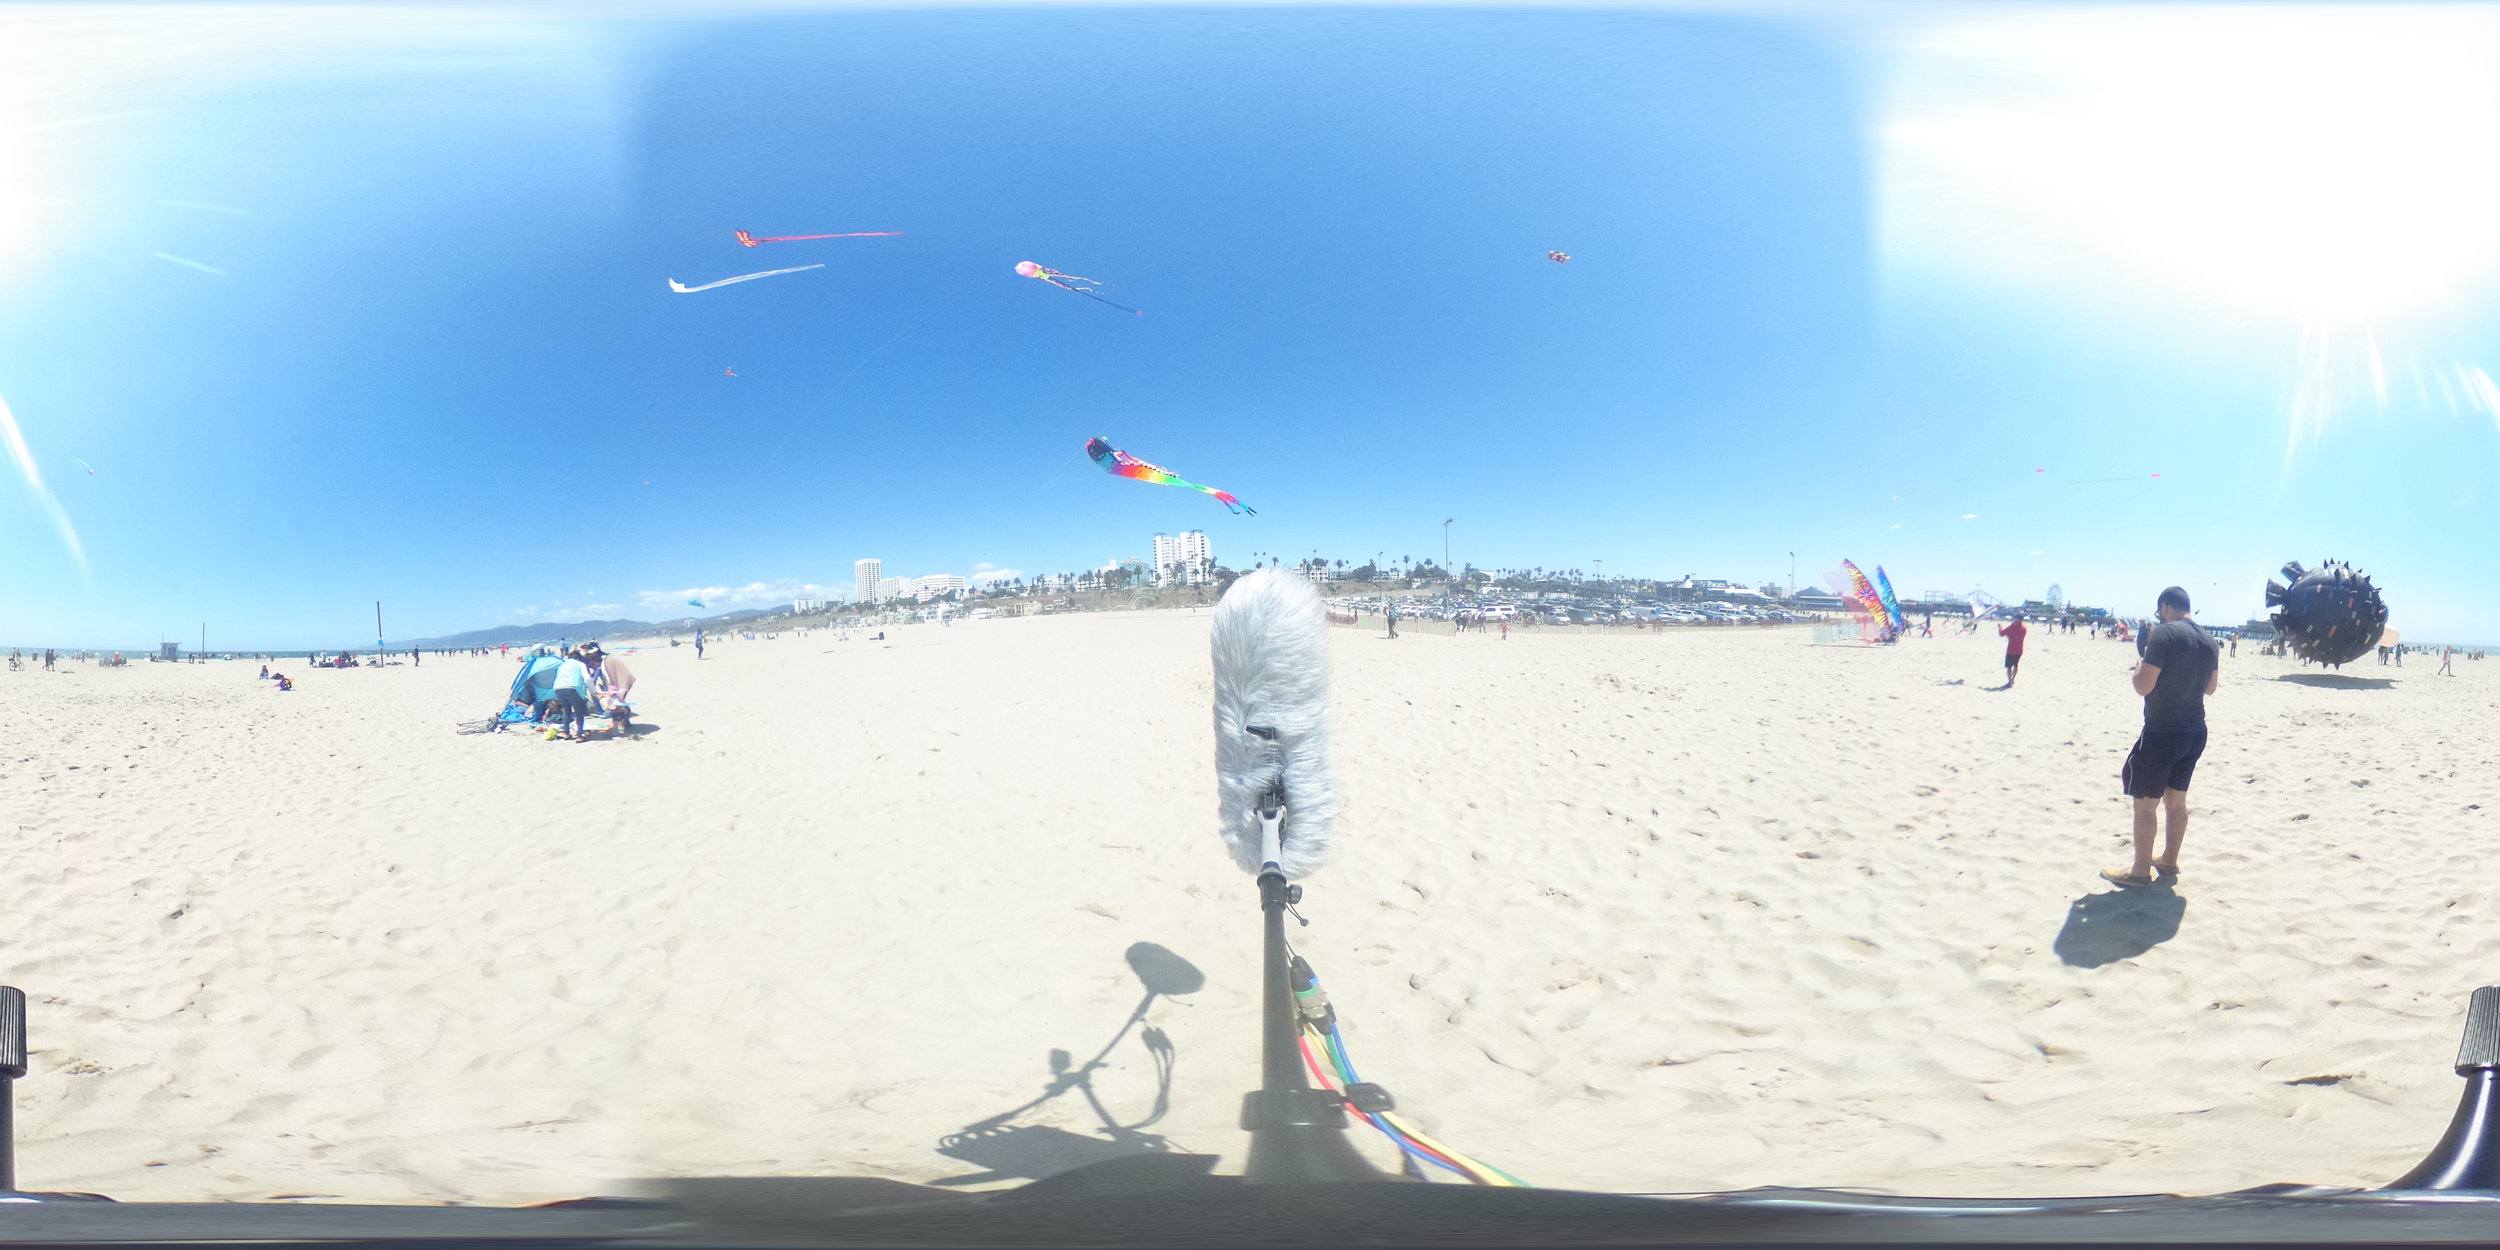 EXT_Day_Beach_MediumWind_MediumToDistantWalla_VeryDistantWaves_JPEG.JPG